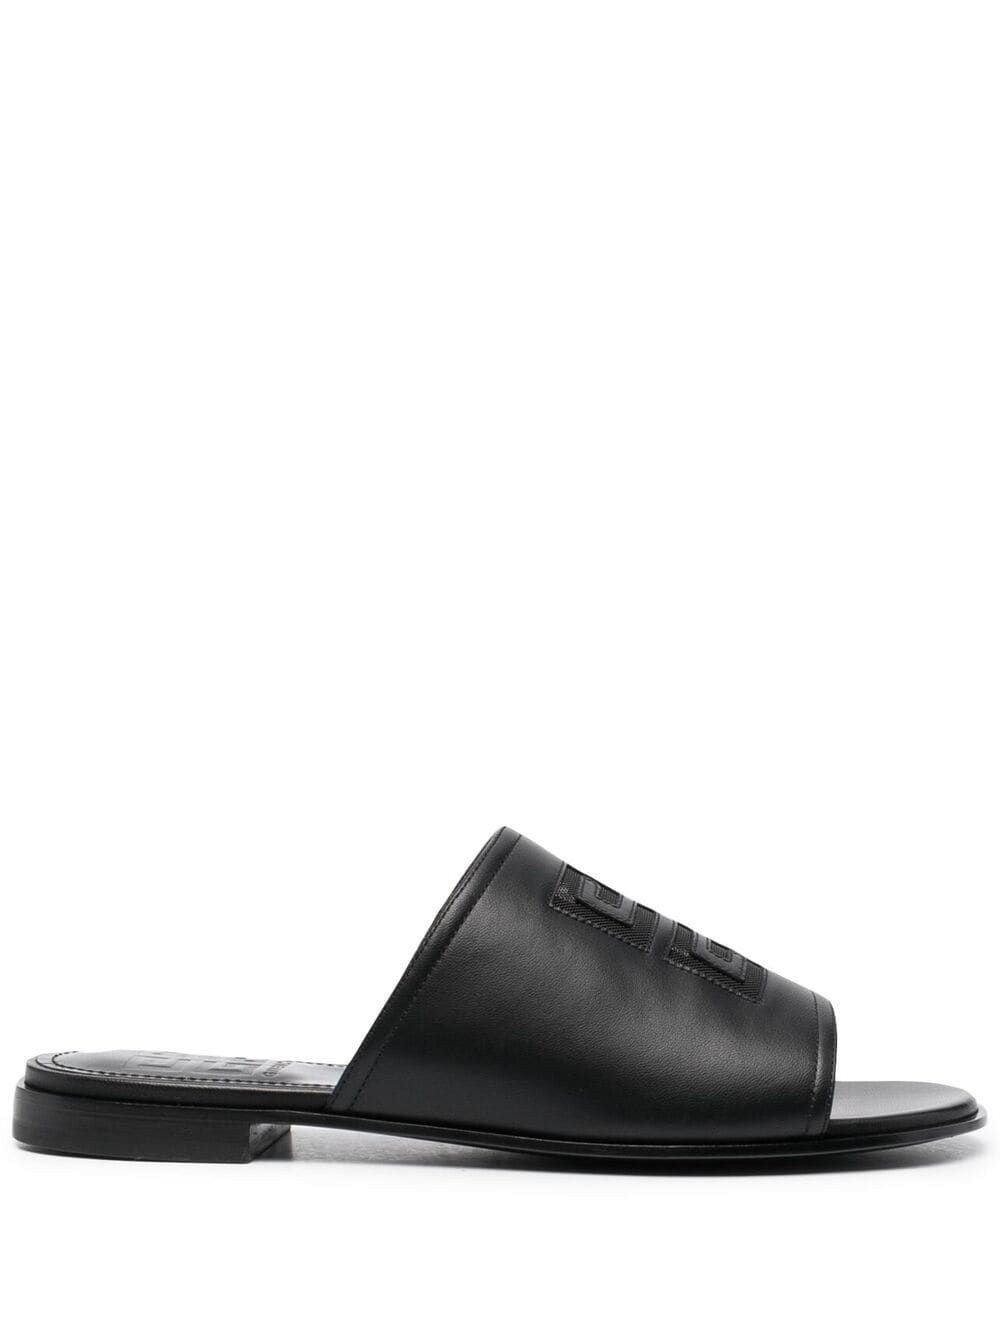 Sandalo 4g in pelle